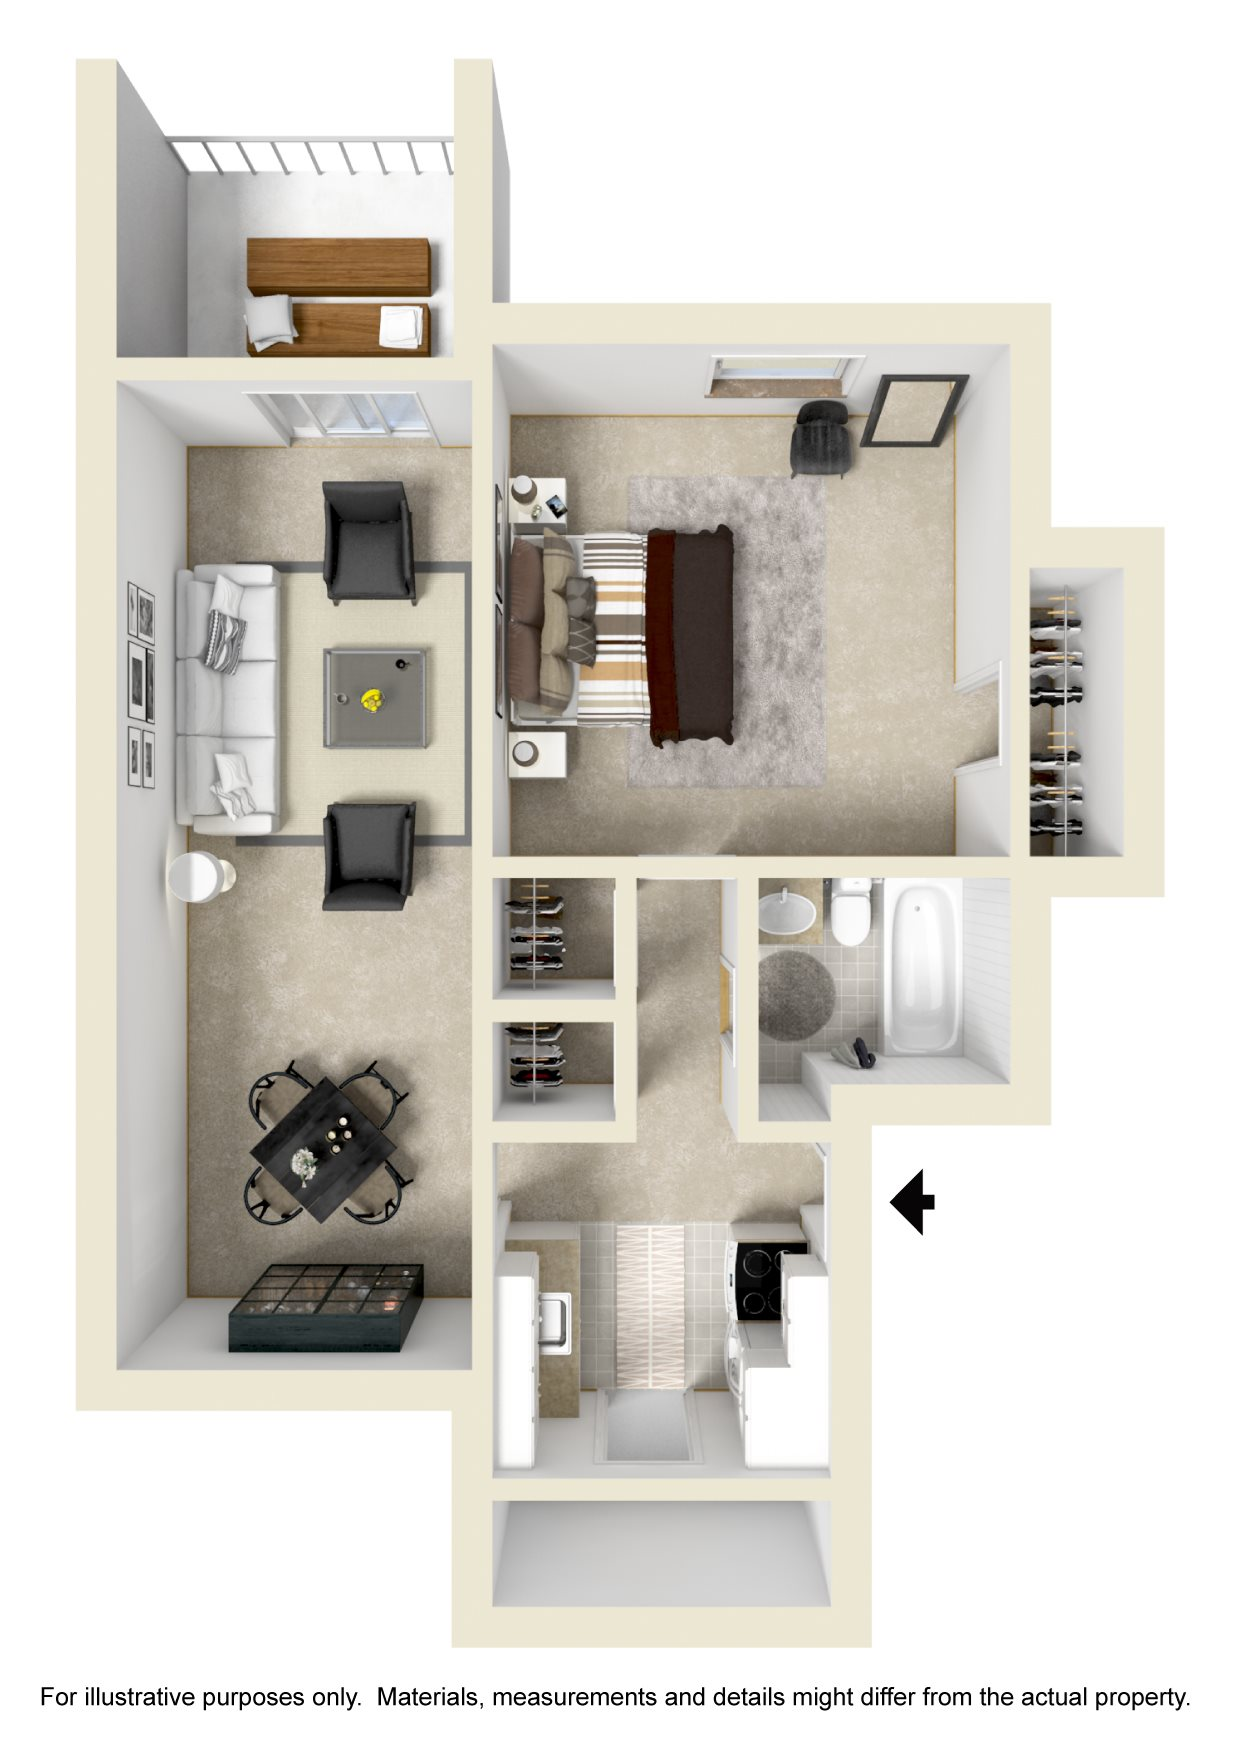 1 BR / 1 BATH 692 SF Floor Plan 2